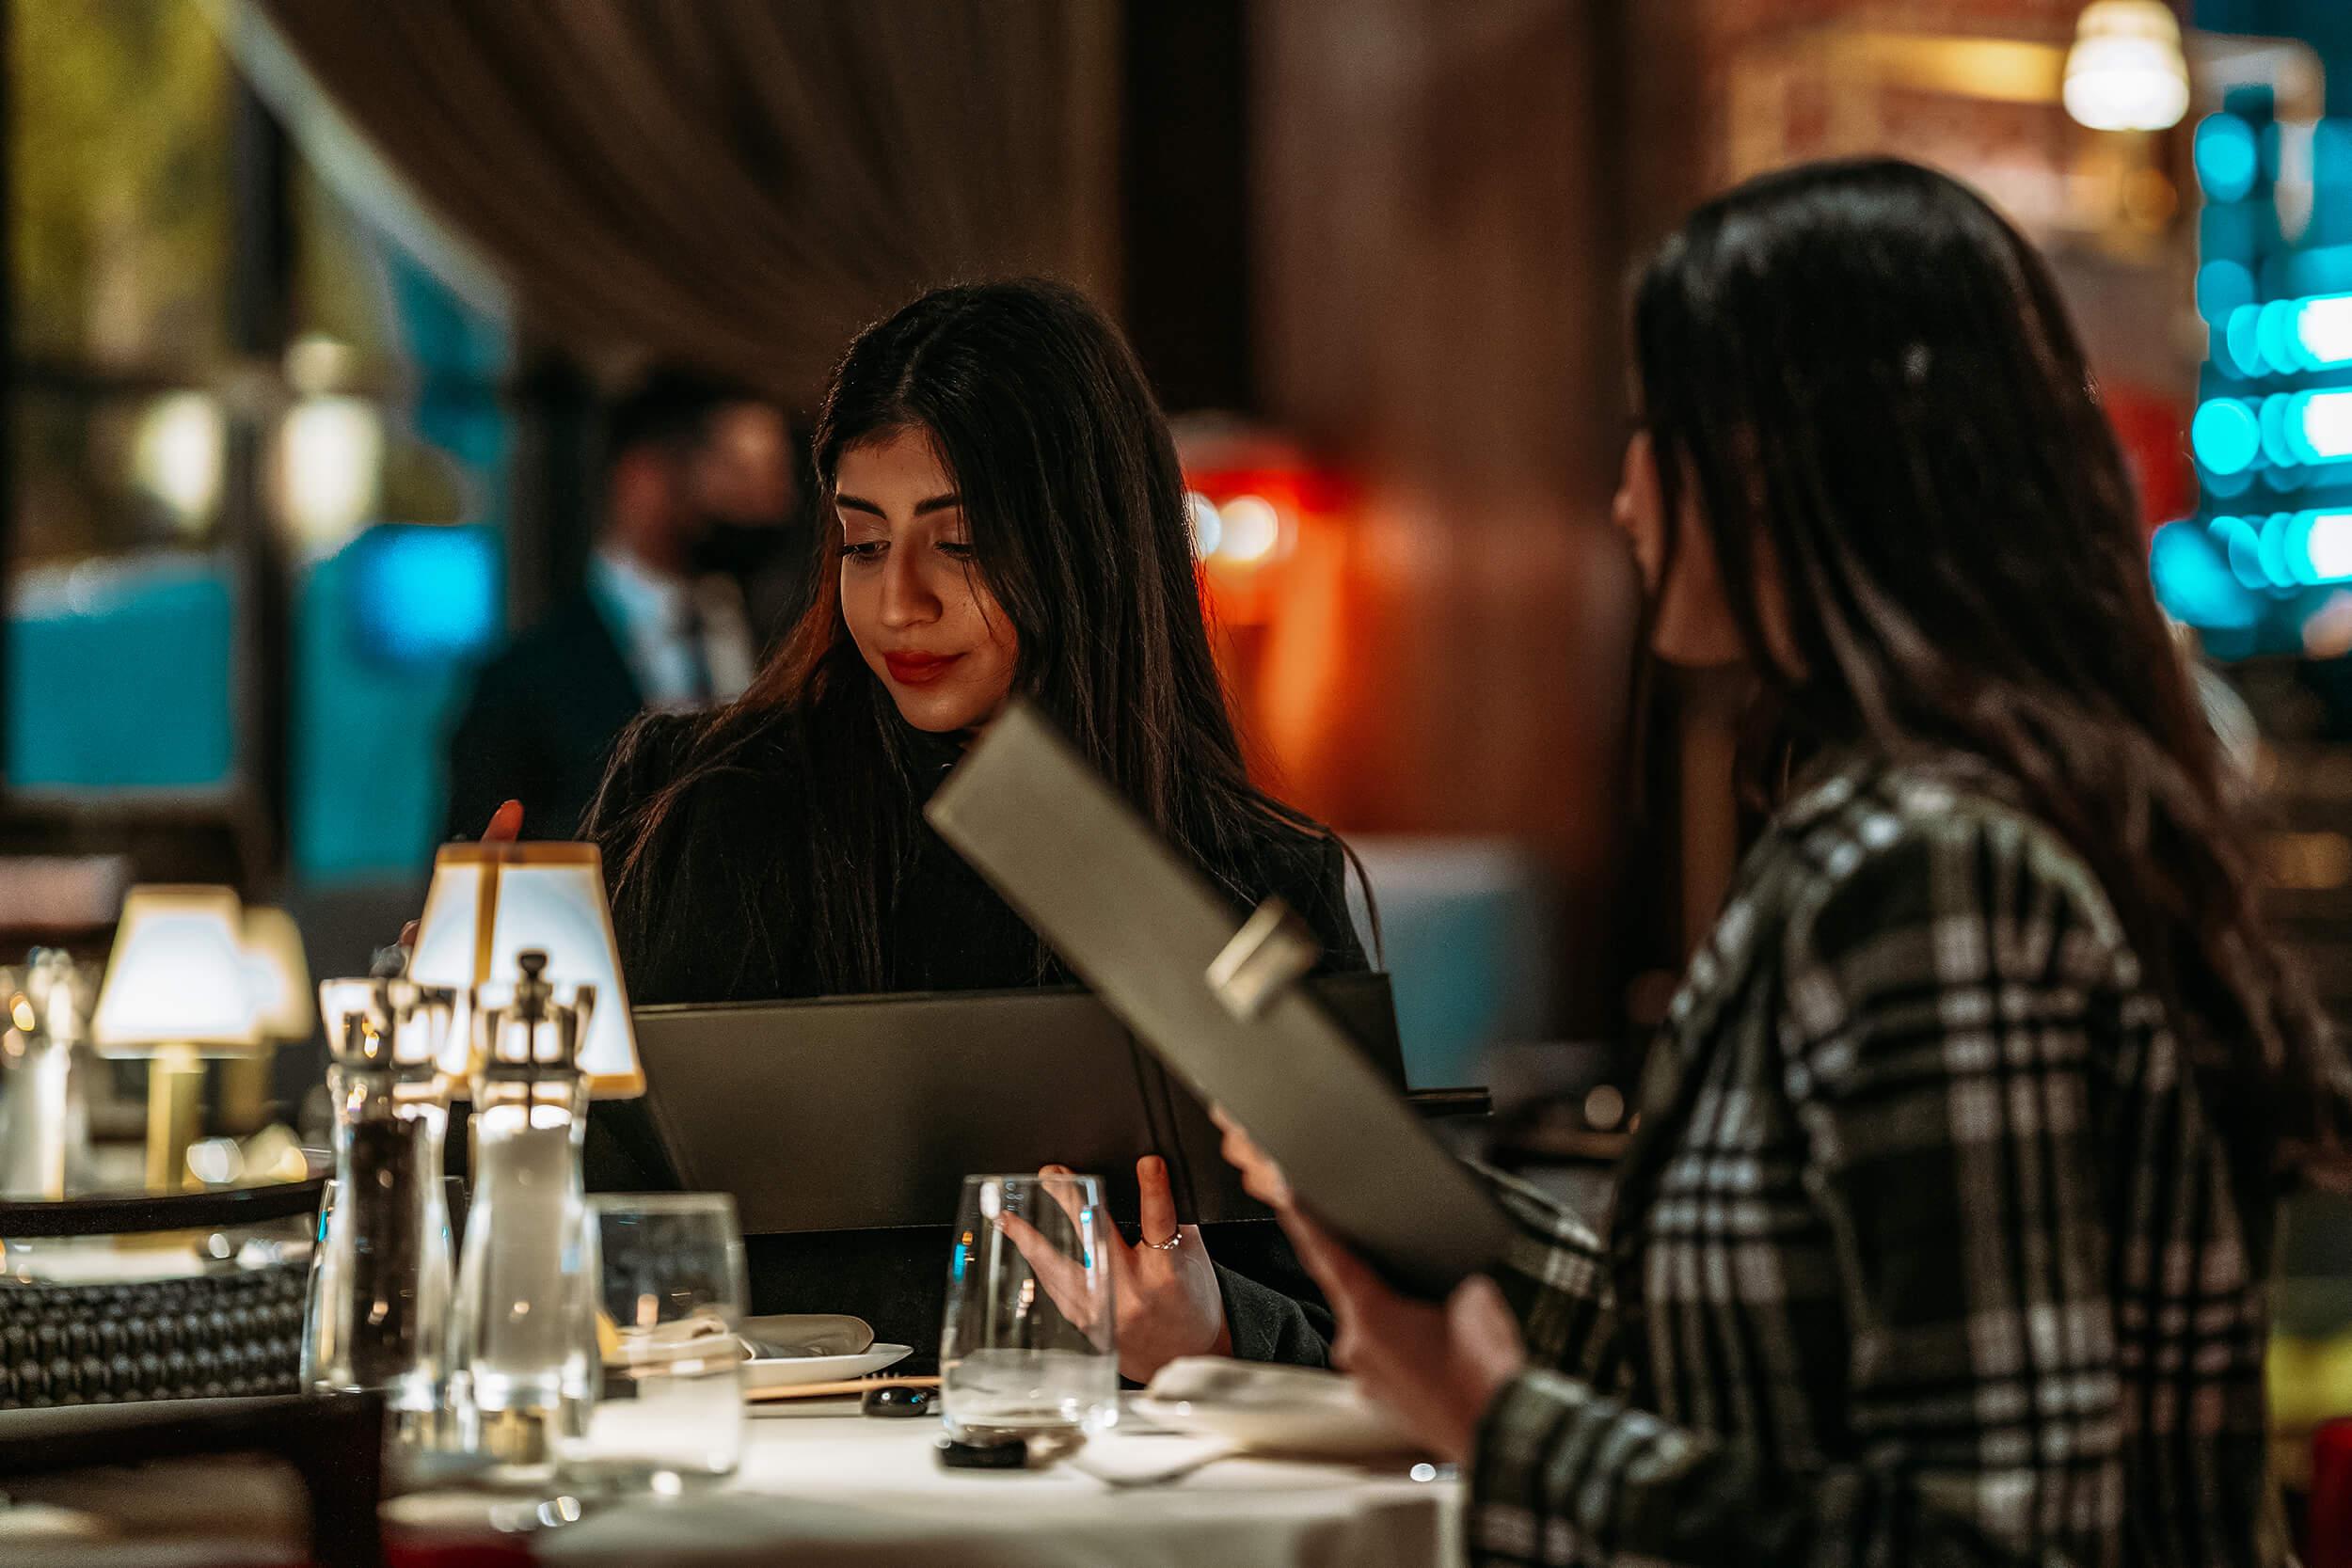 two women looking at menus